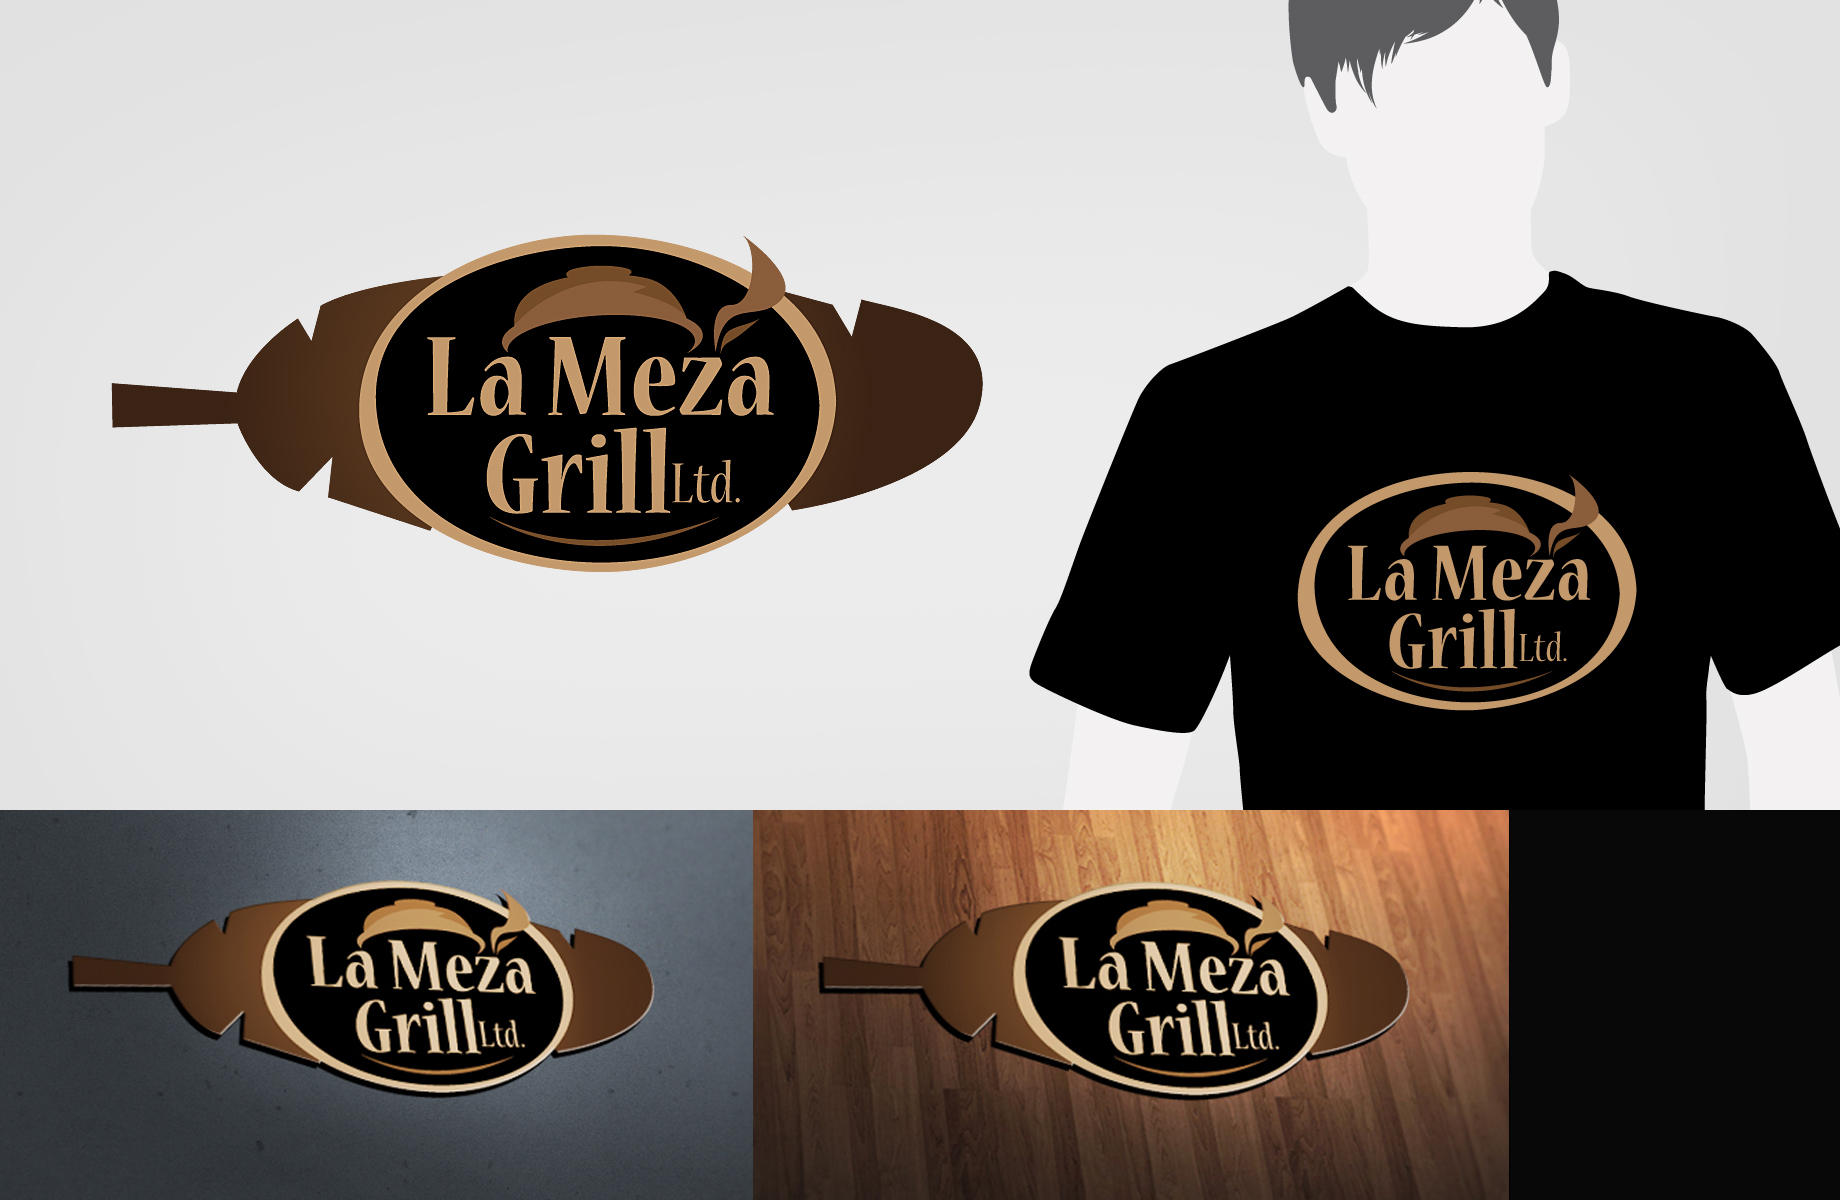 Logo Design by Jan Chua - Entry No. 73 in the Logo Design Contest Inspiring Logo Design for La Meza Grill Ltd..